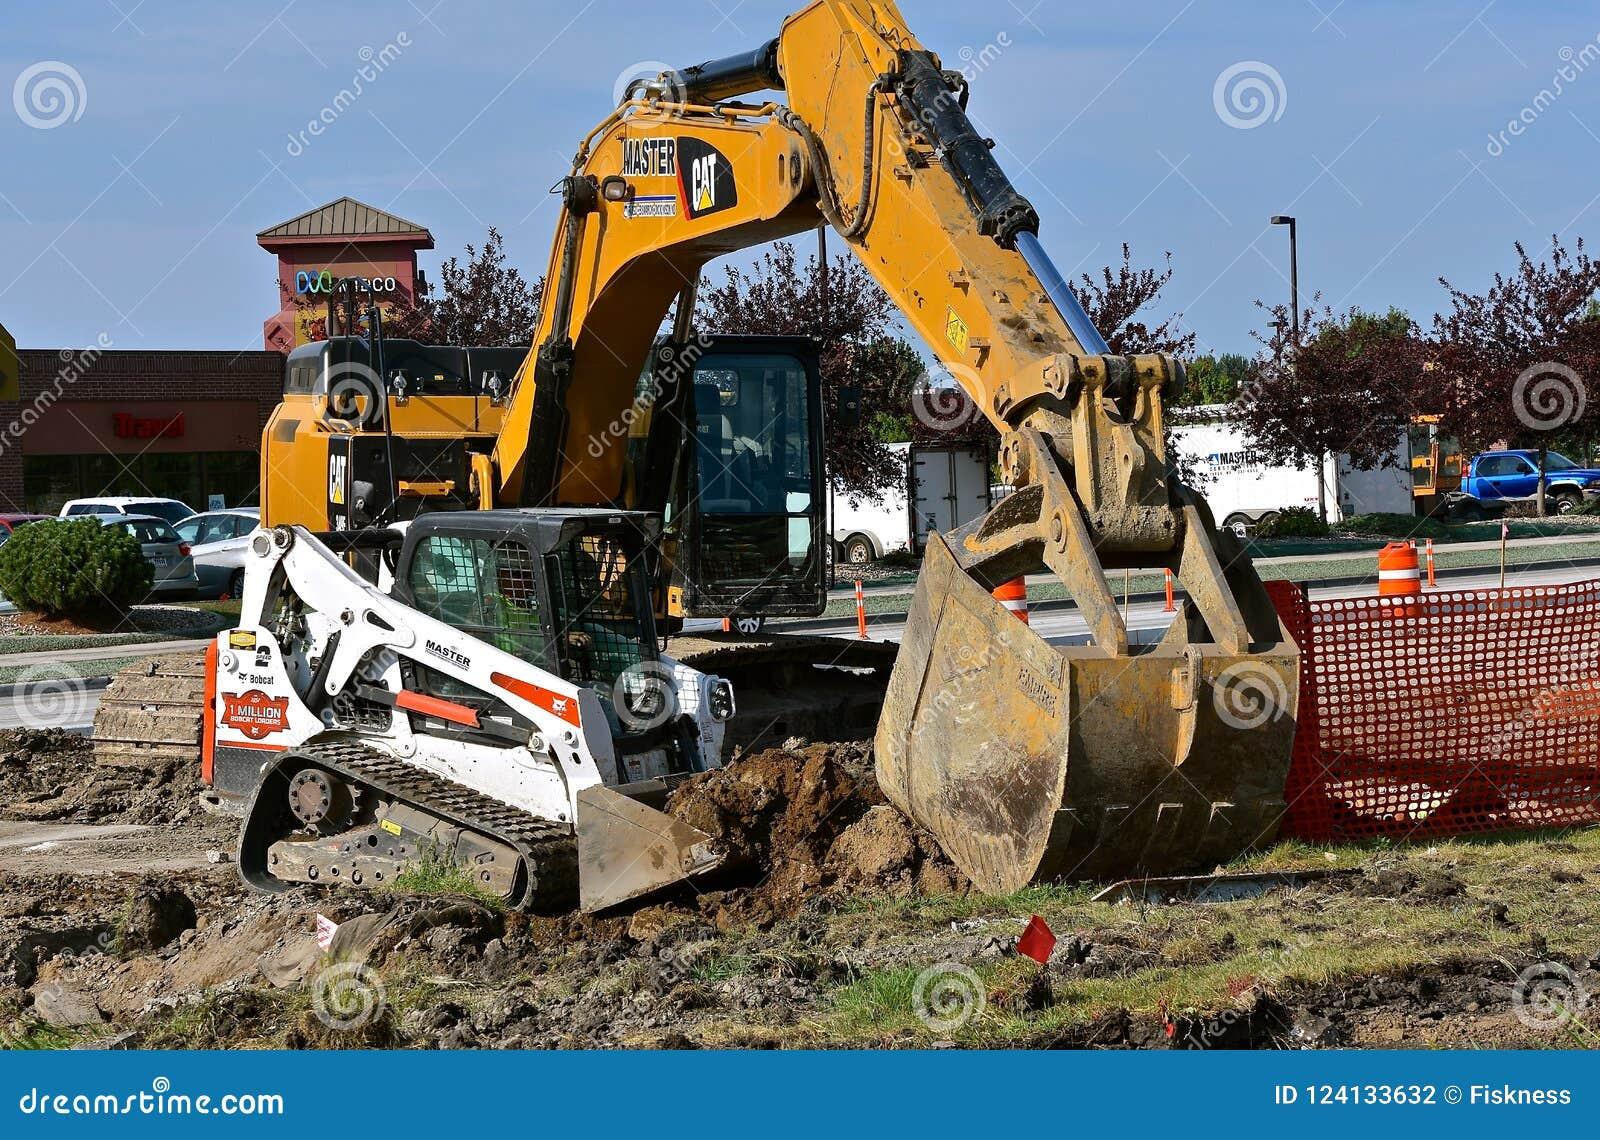 Caterpillar Excavator And Bobcat Skid Steer Editorial